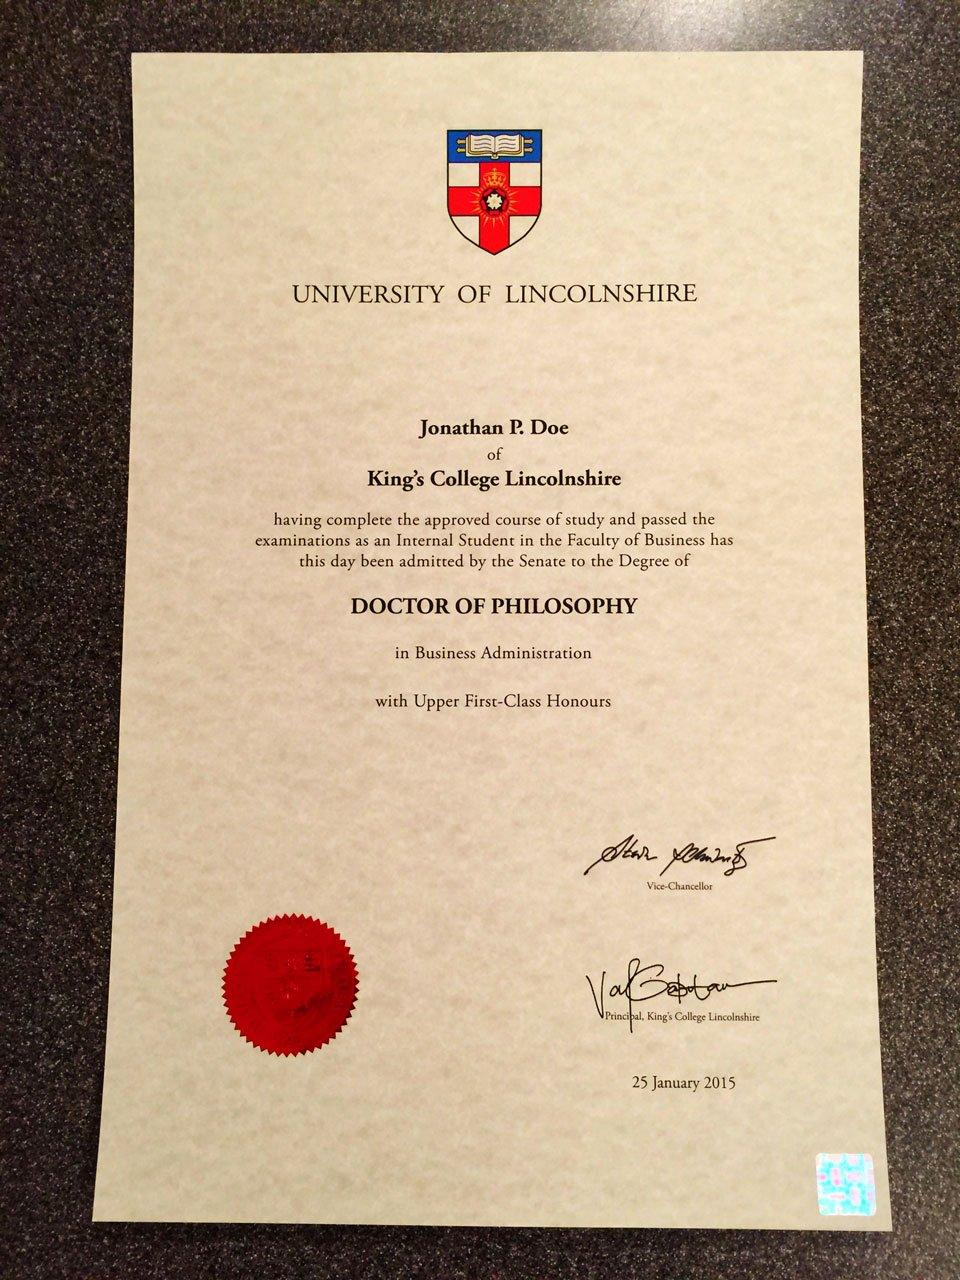 Fake Degree Certificate Template Elegant Fake College & University Diplomas